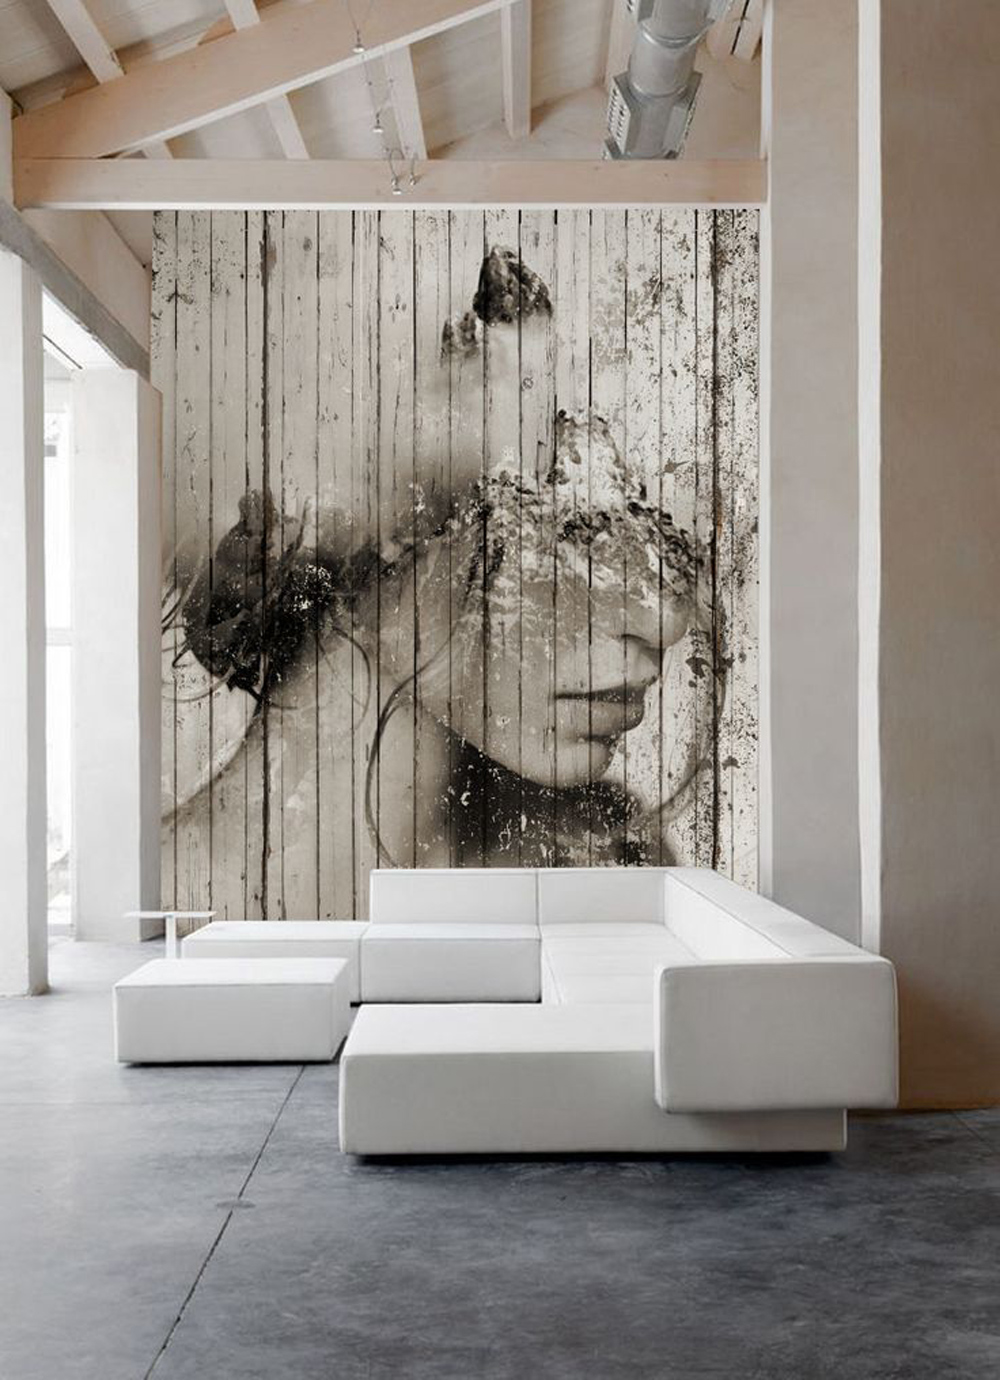 Oracle, Fox, Sunday, Sanctuary, Art, Wall, gallery, Wall, Interior, Library, Wall, Artwork